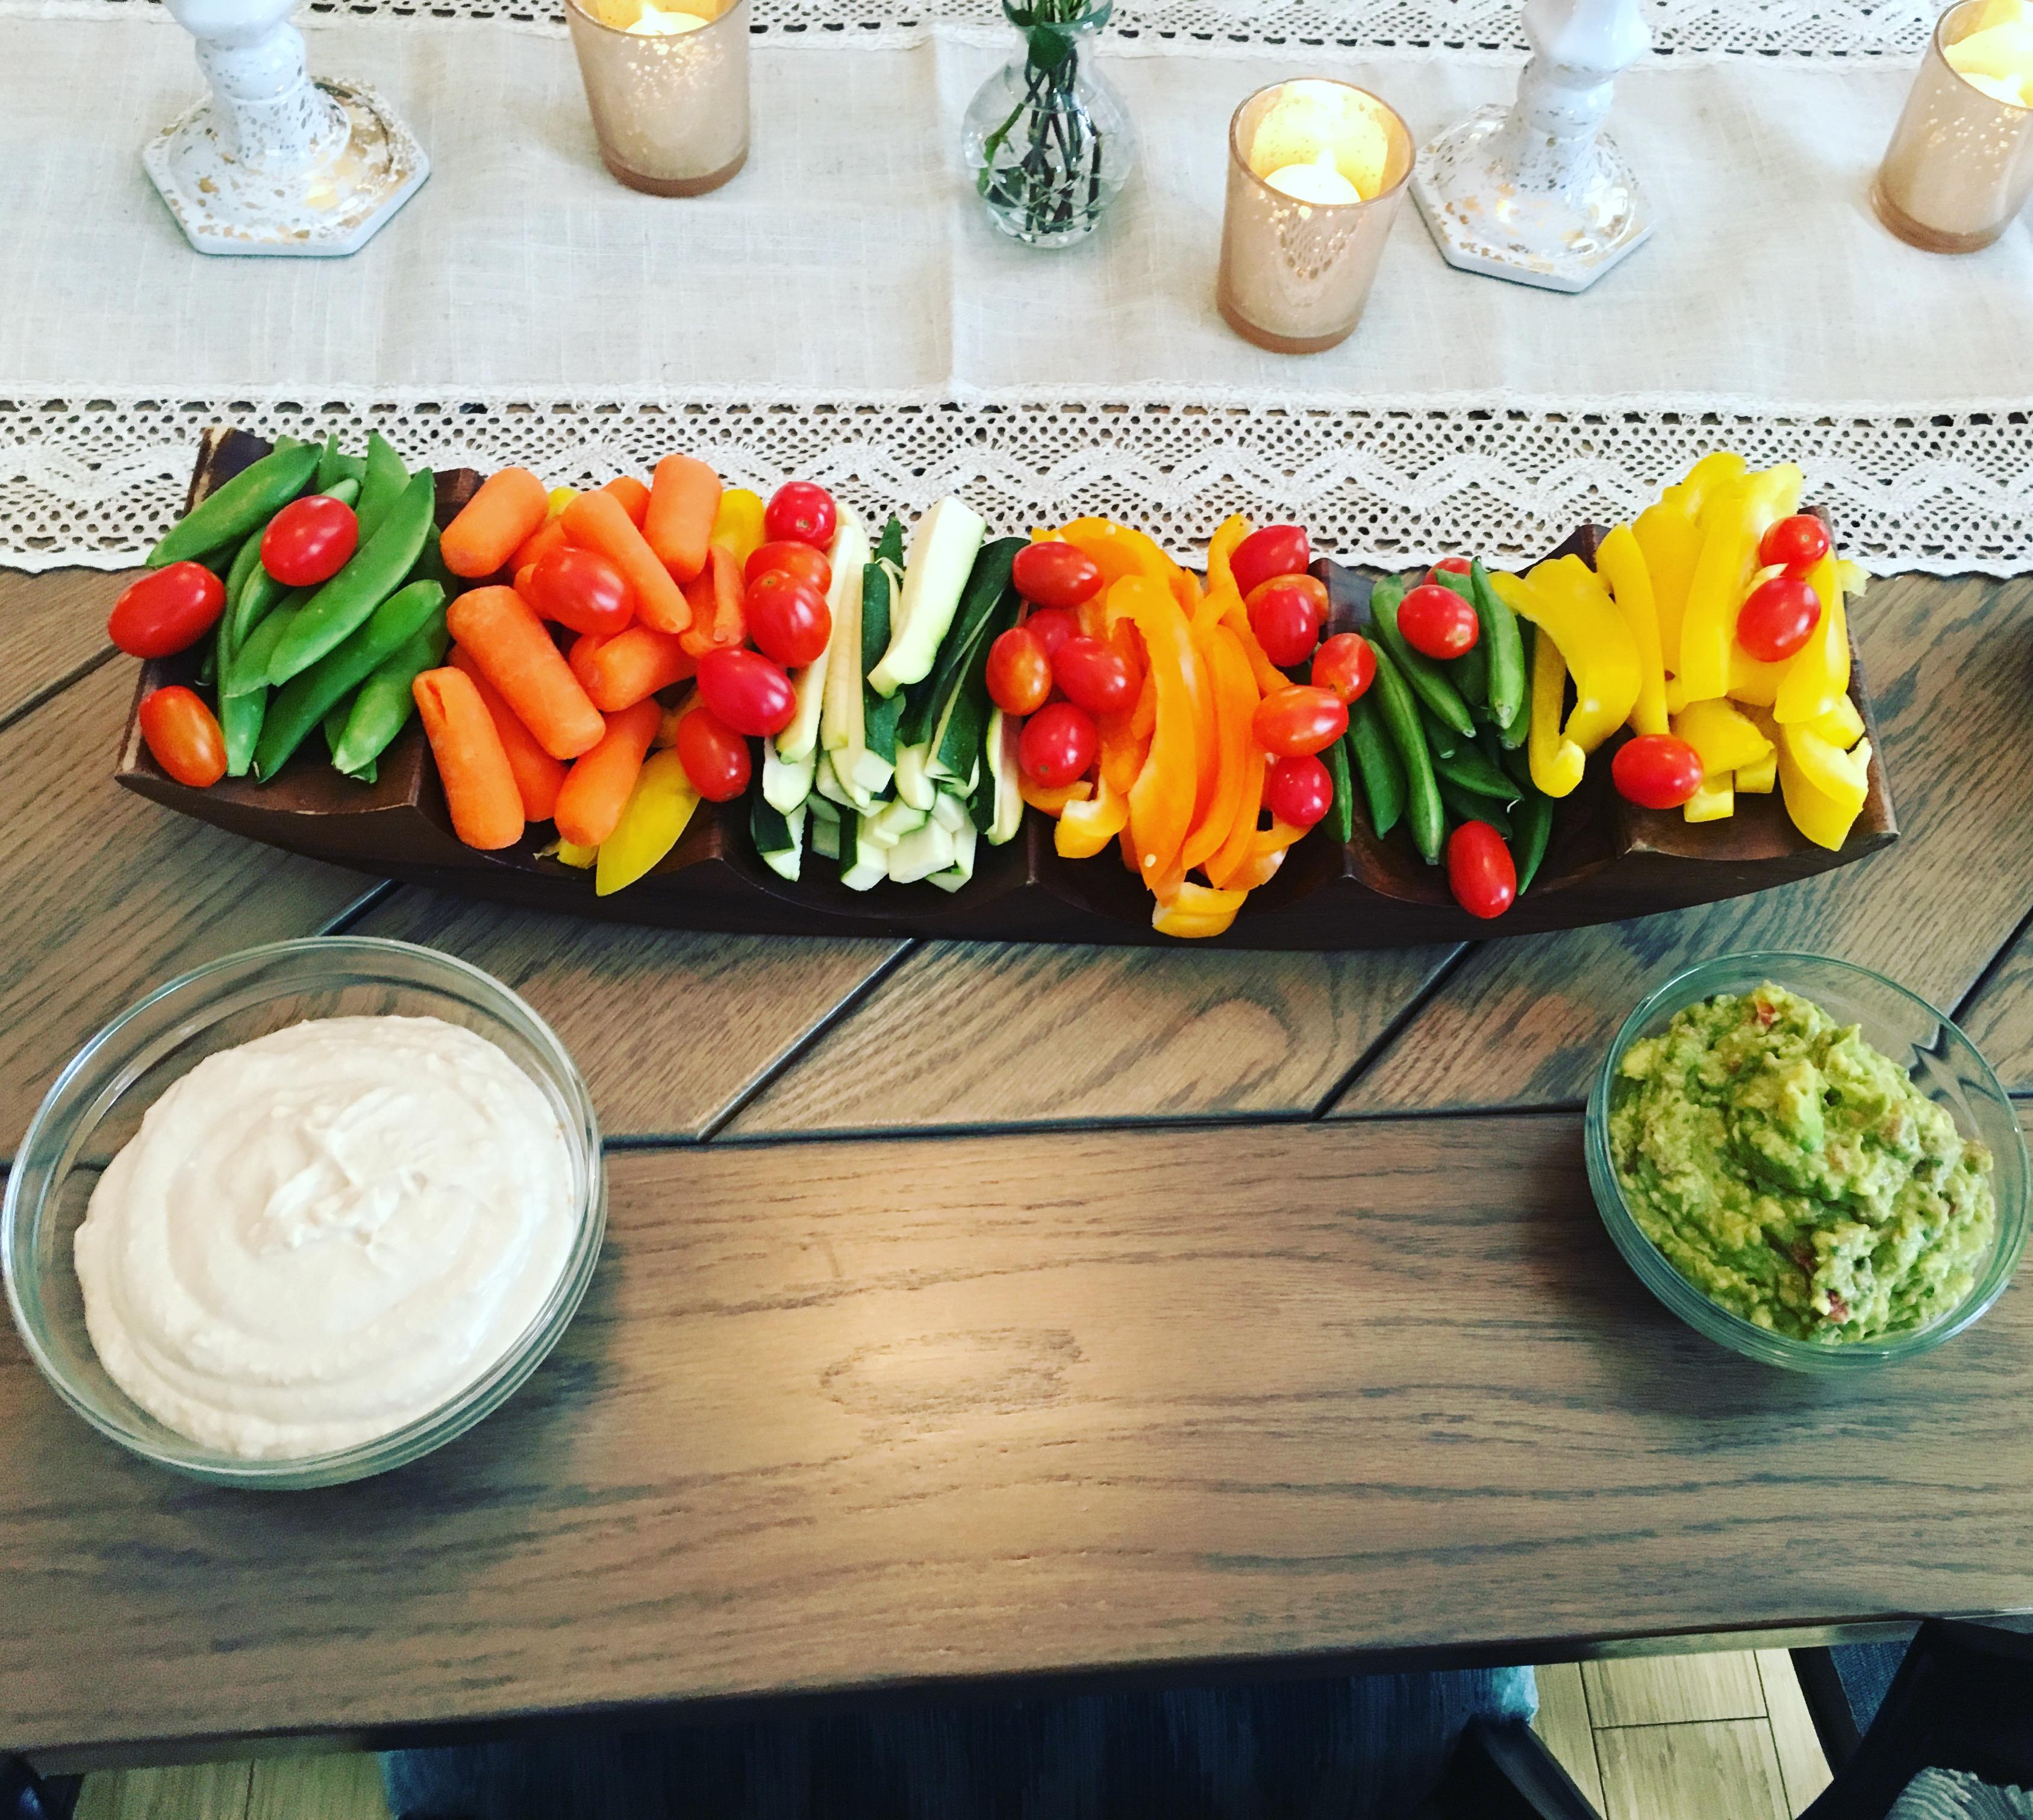 Veggie platter with hummus & guac